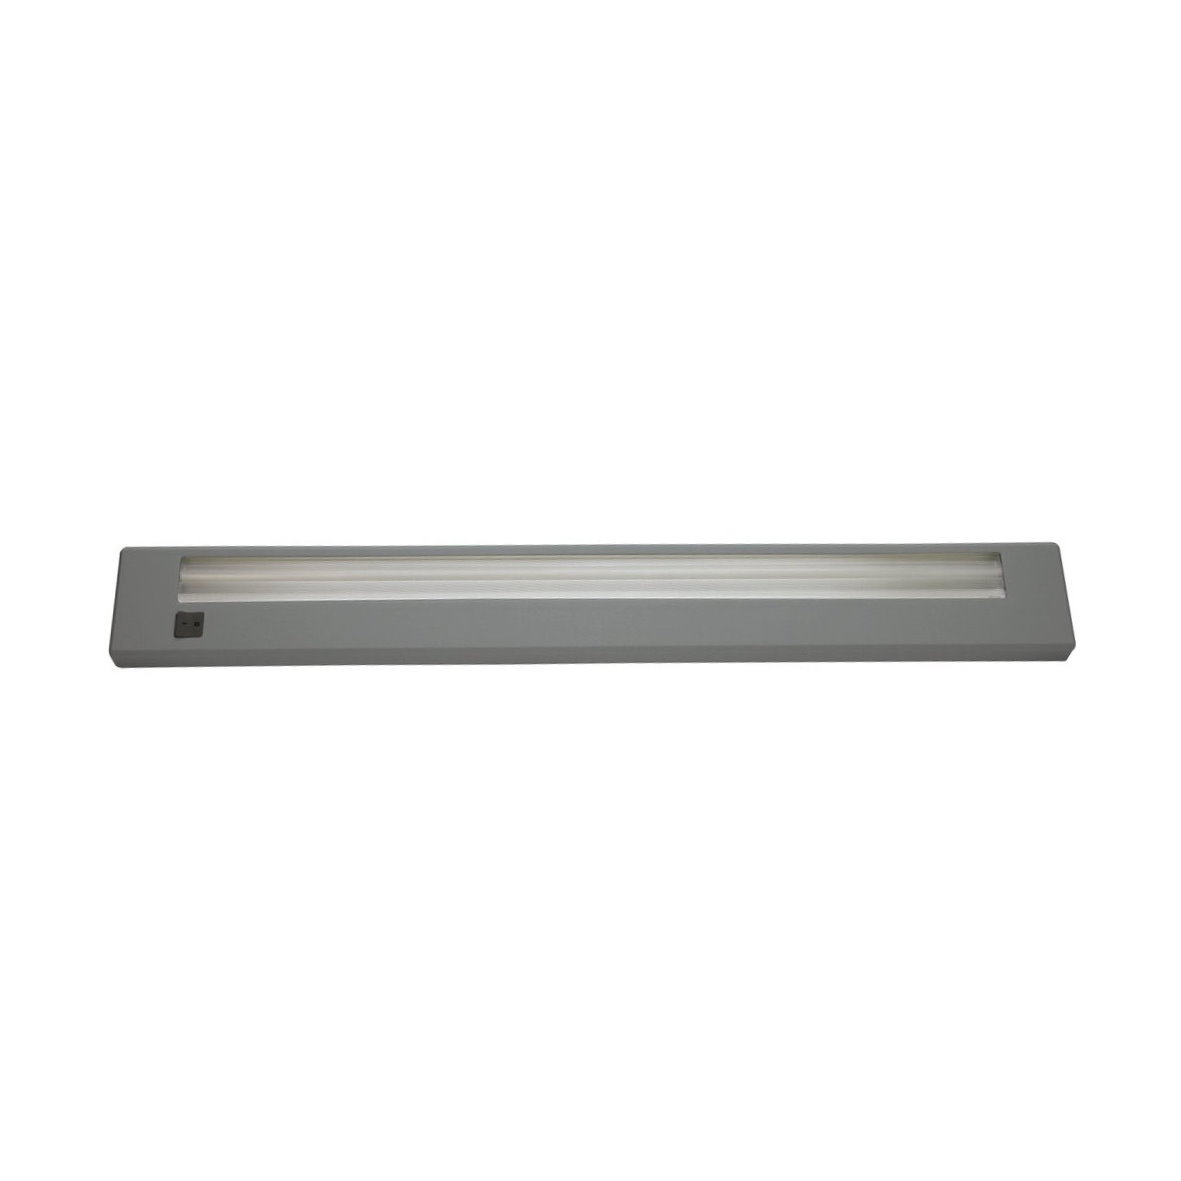 soubassement luminaire incl n on t5 base lampe de barre de lumi re ebay. Black Bedroom Furniture Sets. Home Design Ideas